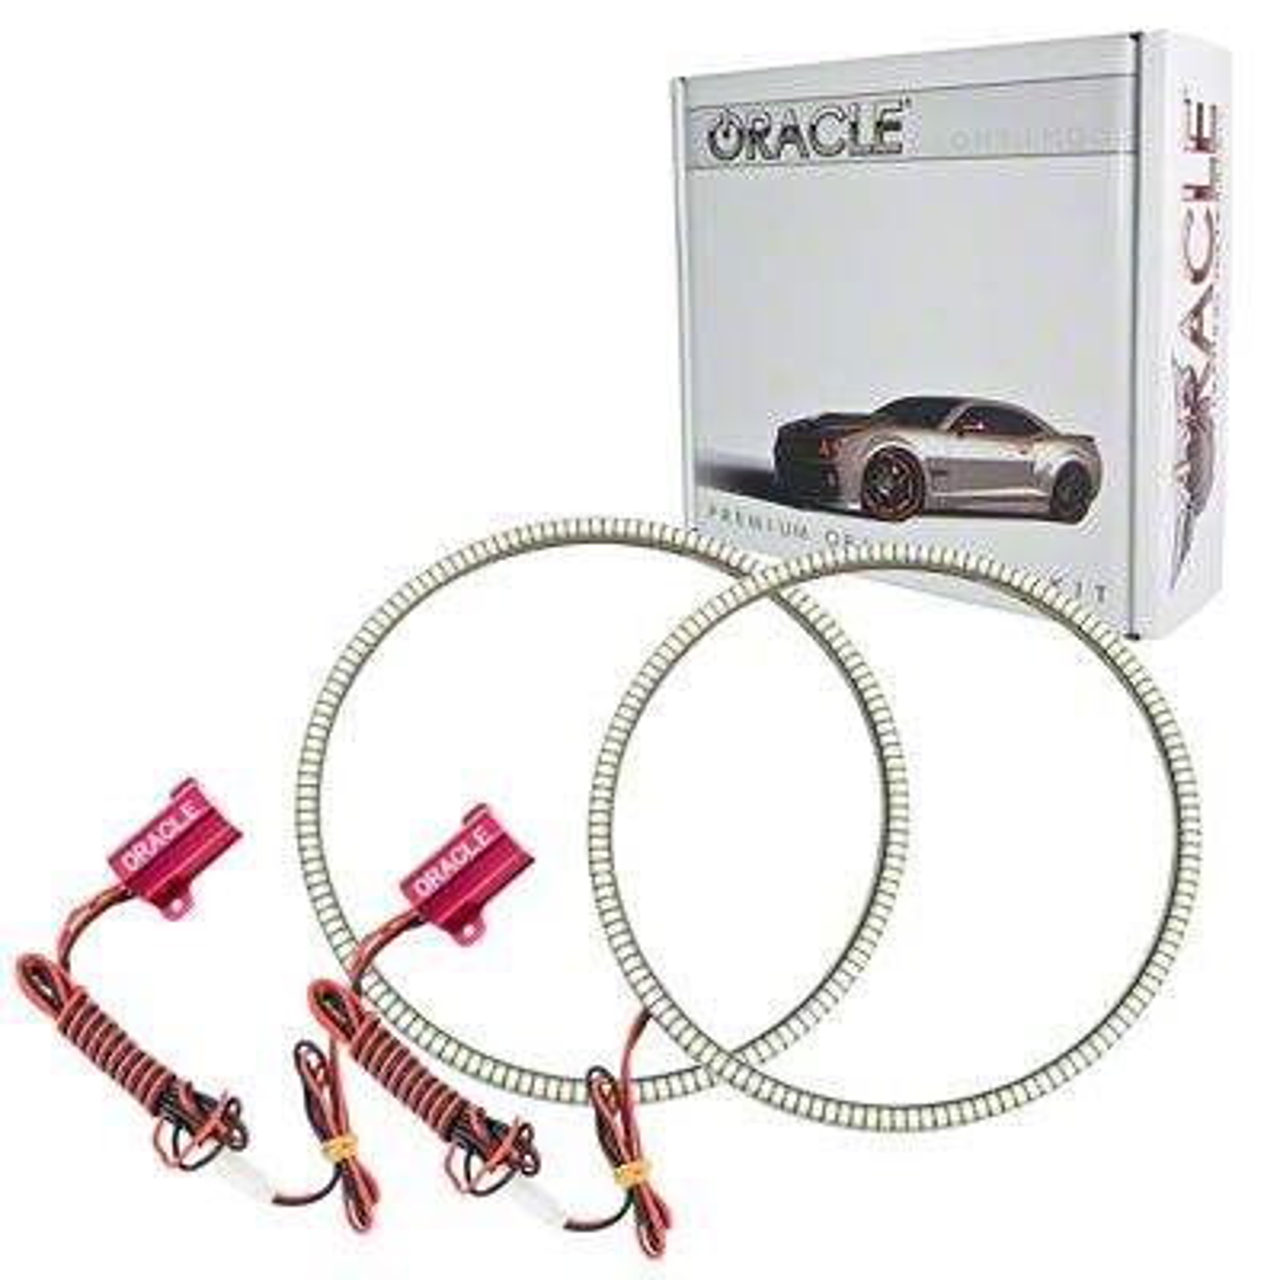 Oracle LED Waterproof Headlight Halo Conversion Kit - Blue (07-18 Jeep Wrangler JK)